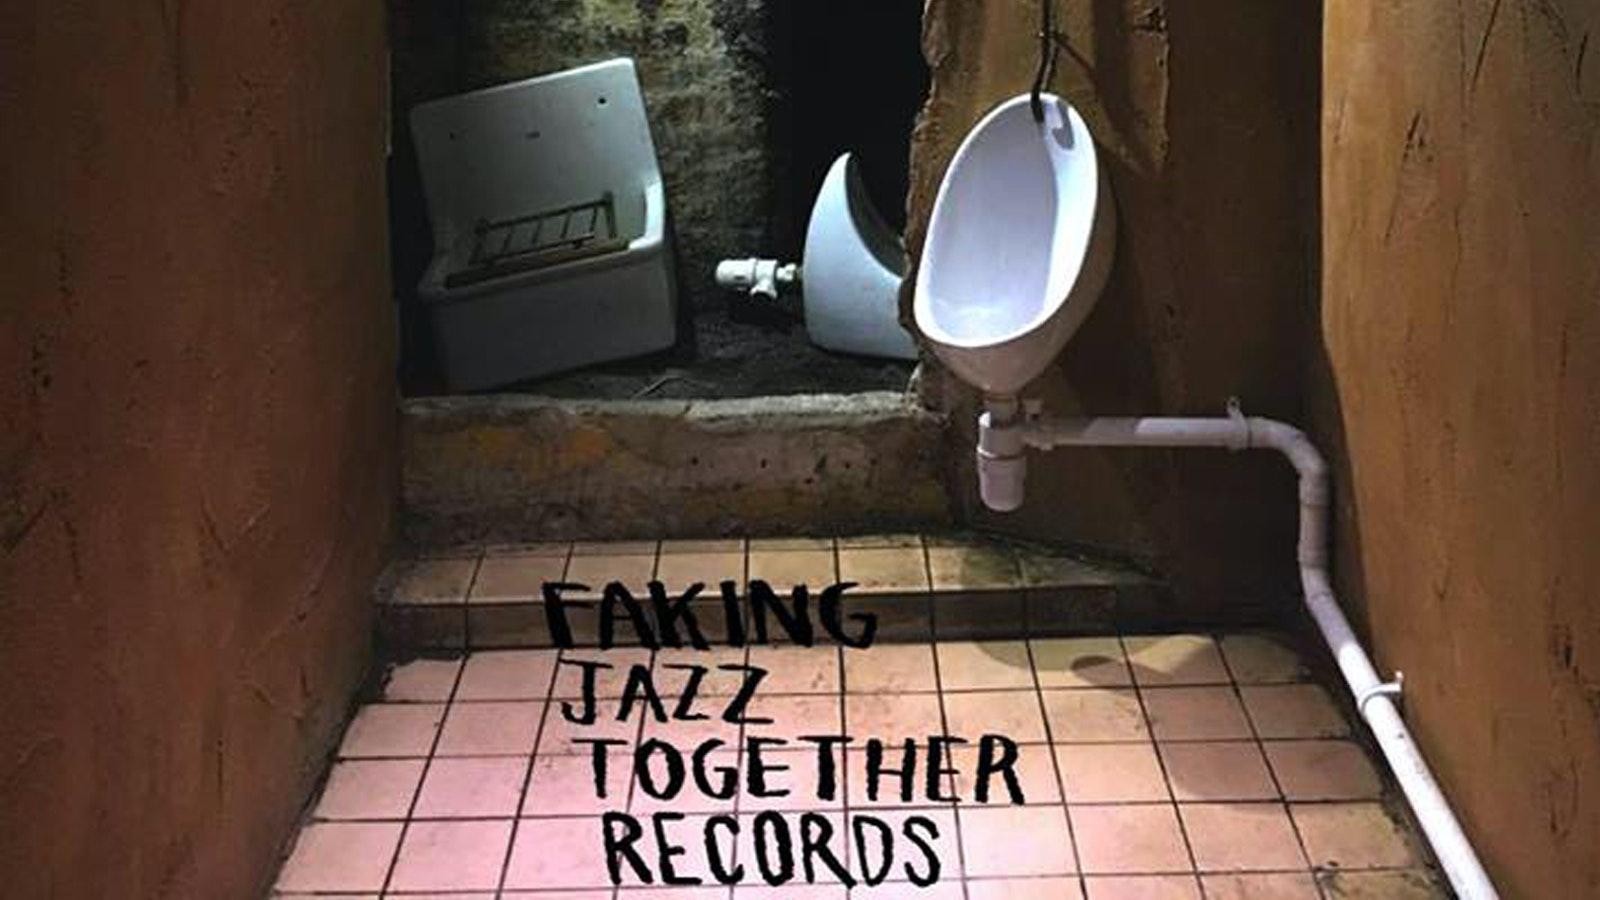 Faking Jazz Together